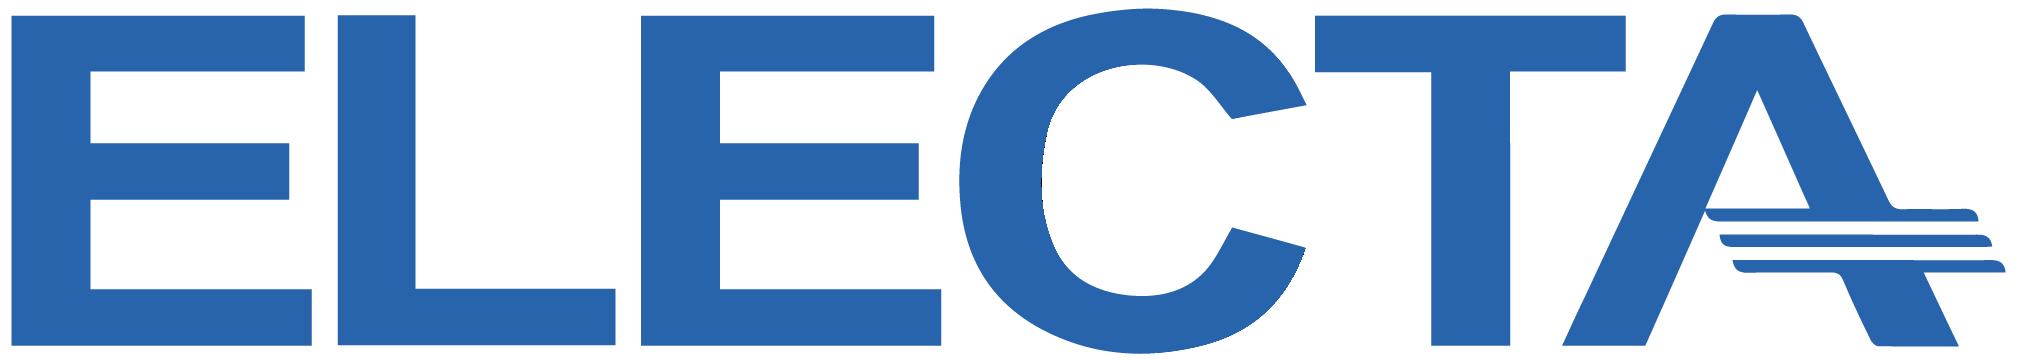 electa-logo-alpha